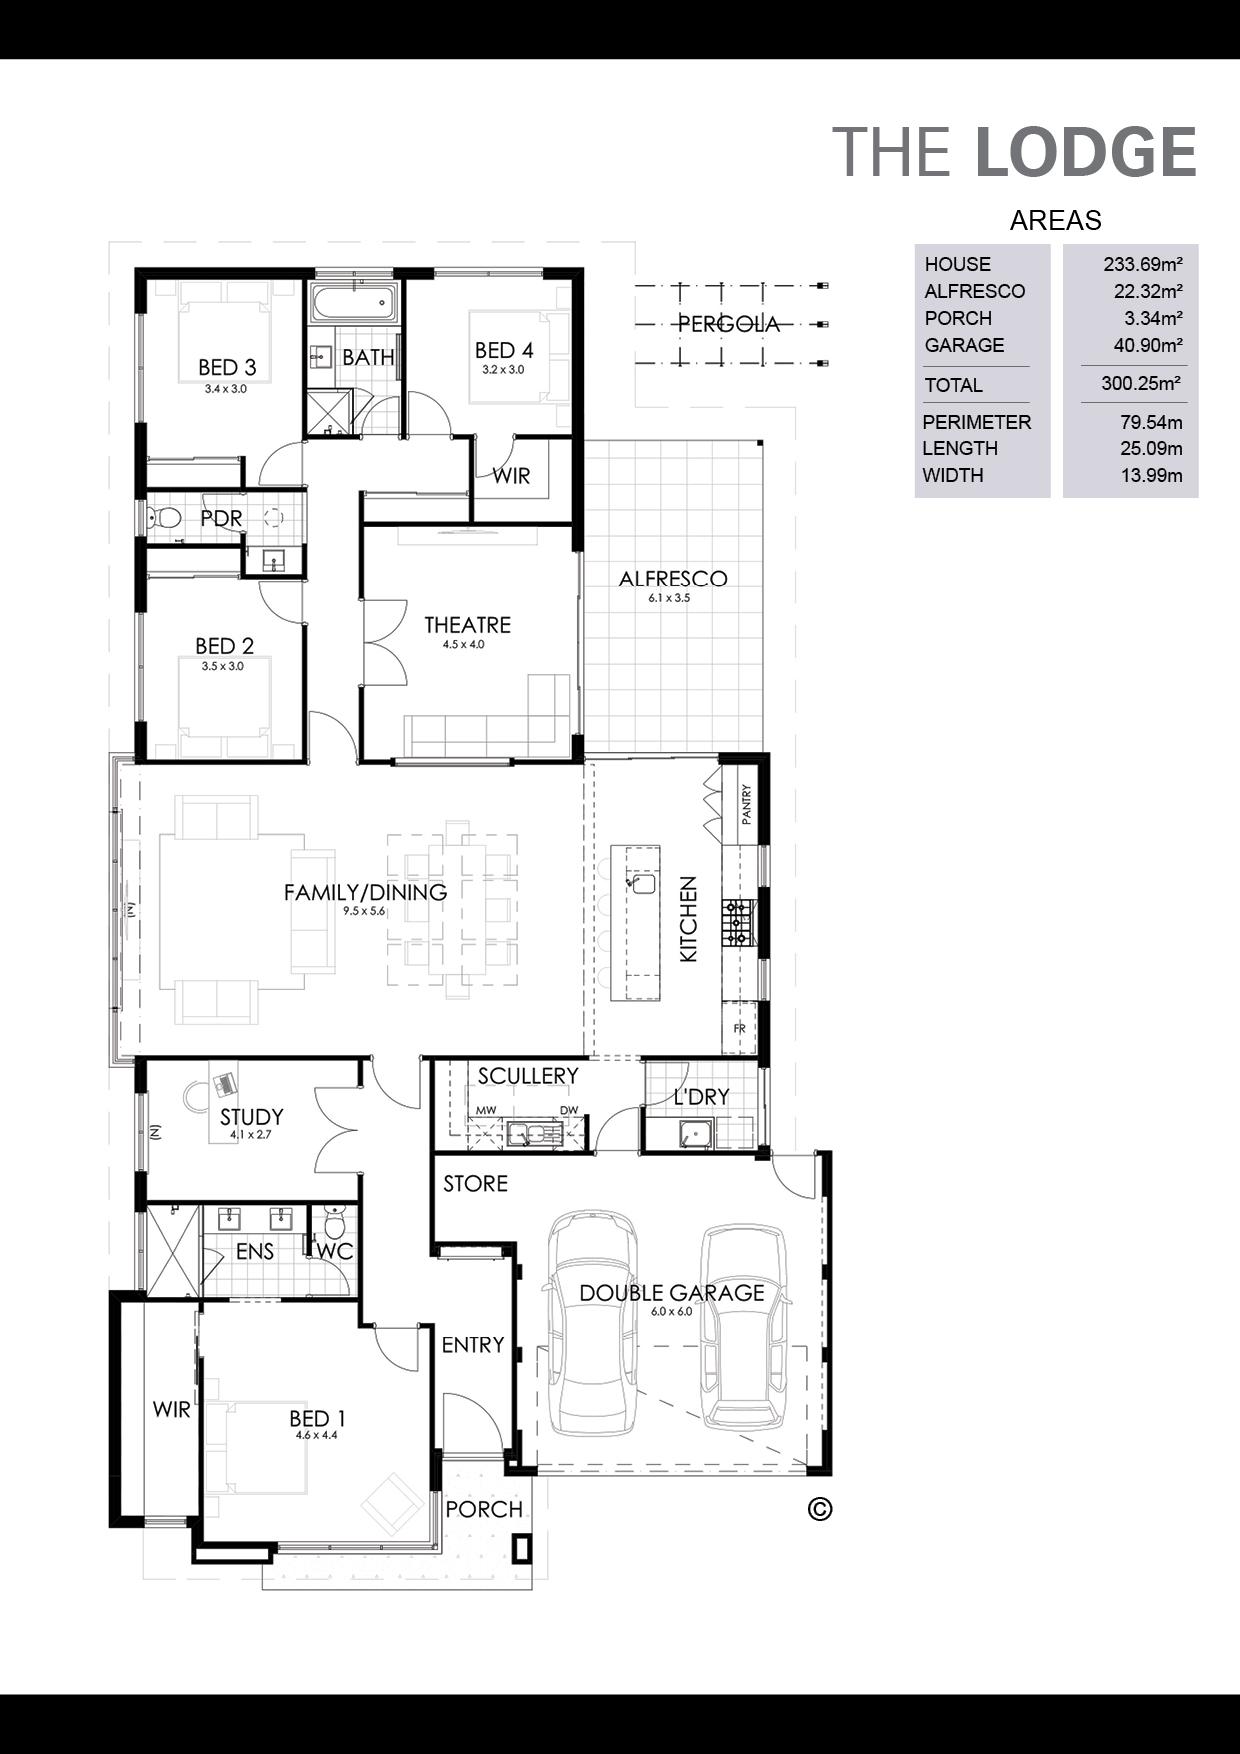 The Lodge Floorplan